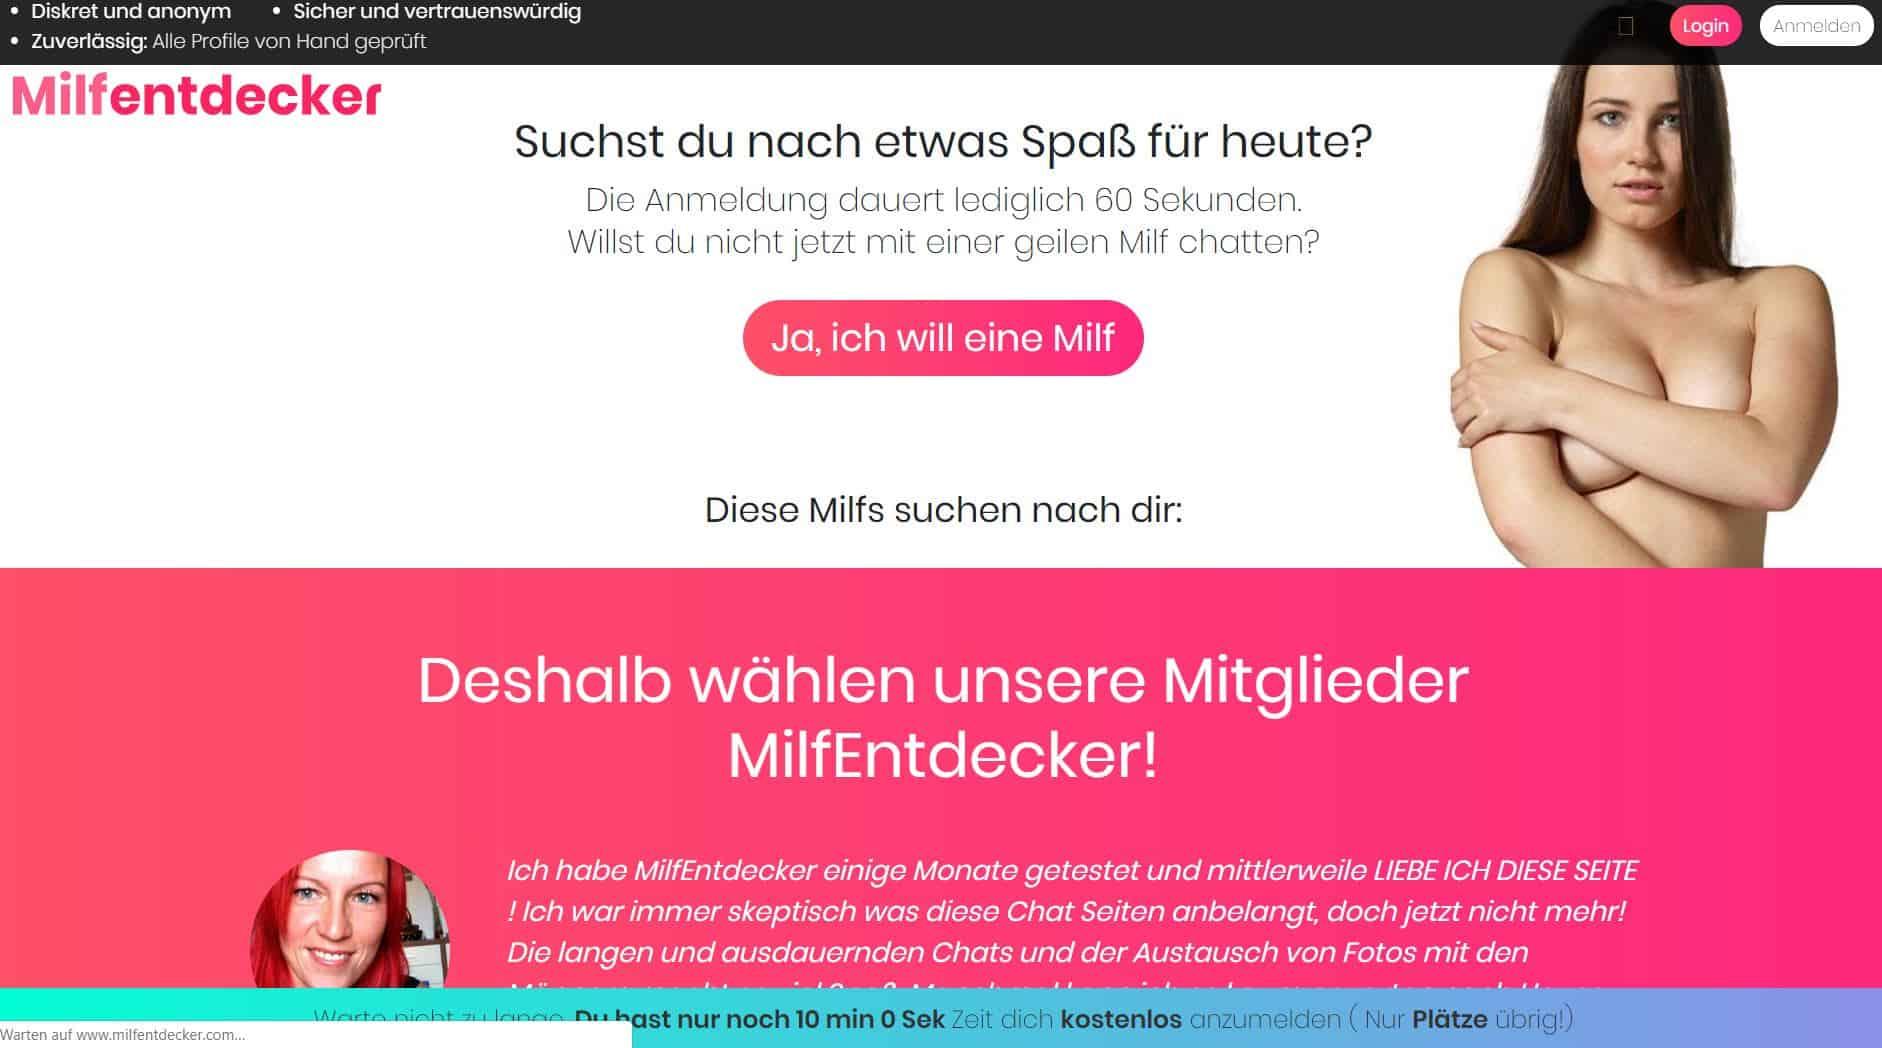 Testbericht: MilfEntdecker.com Abzocke